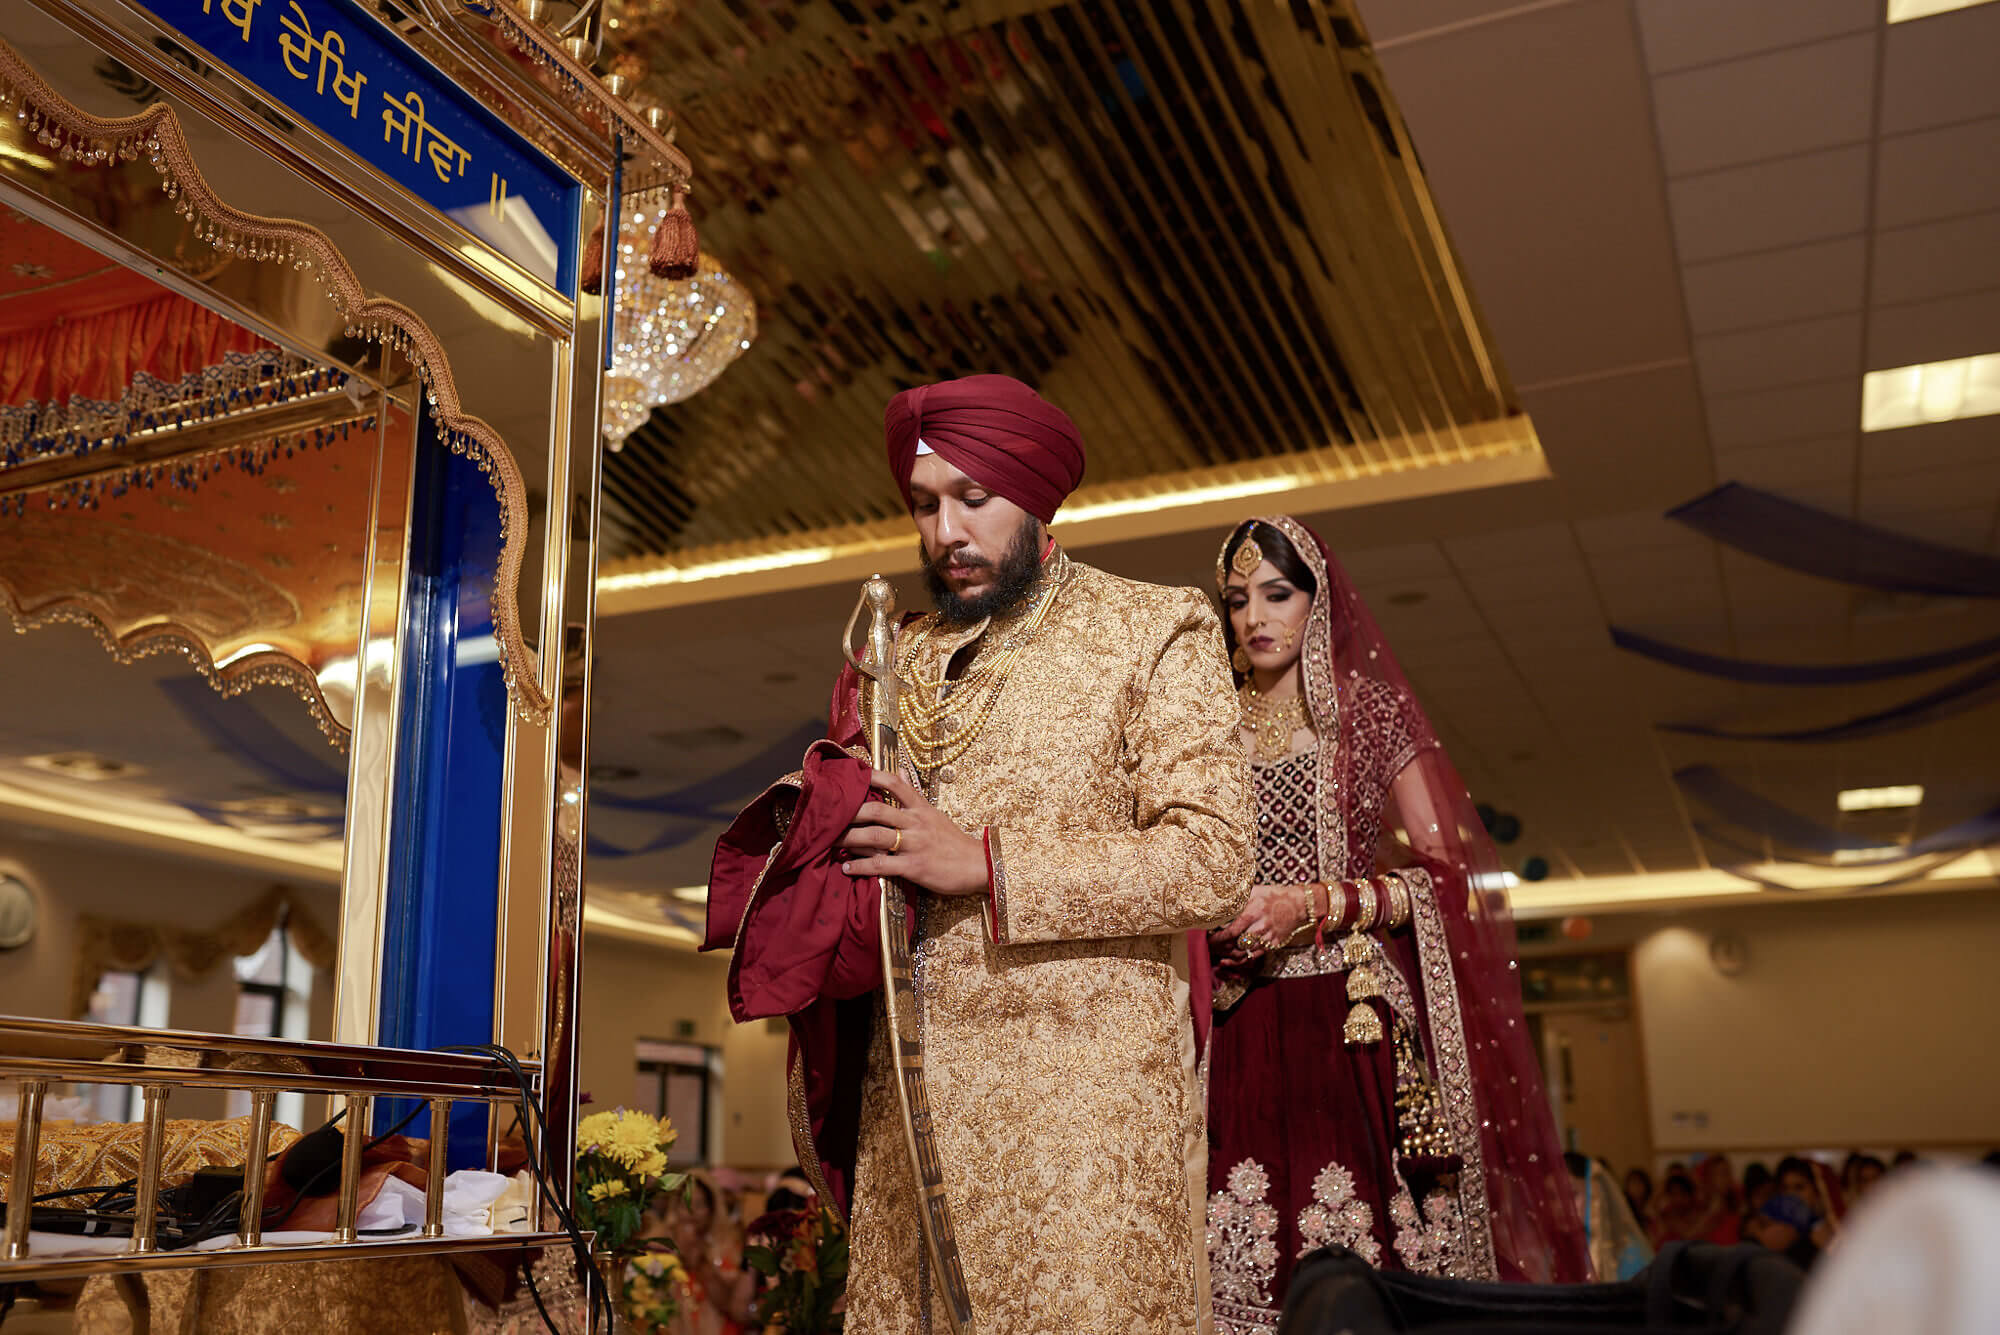 sikh-wedding-photography-002.jpg